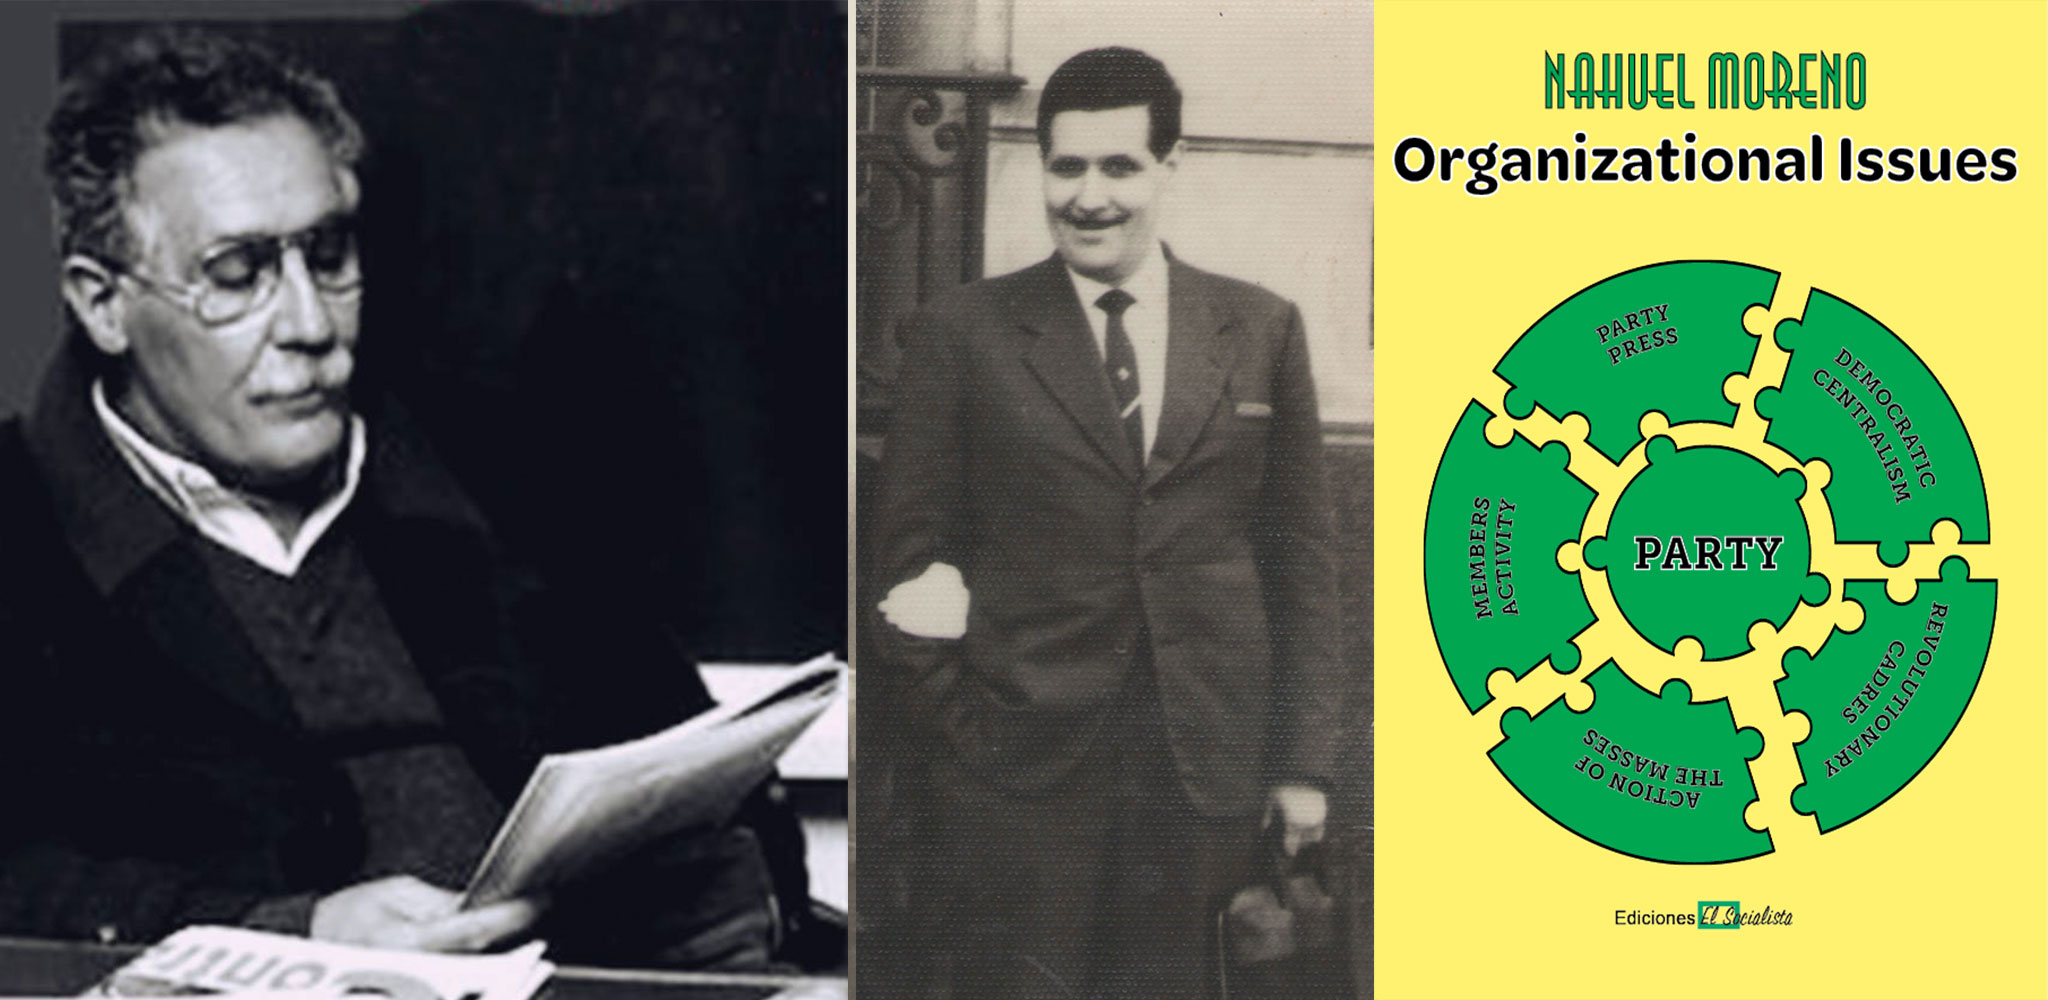 ORGANIZATIONAL ISSUES (1984)